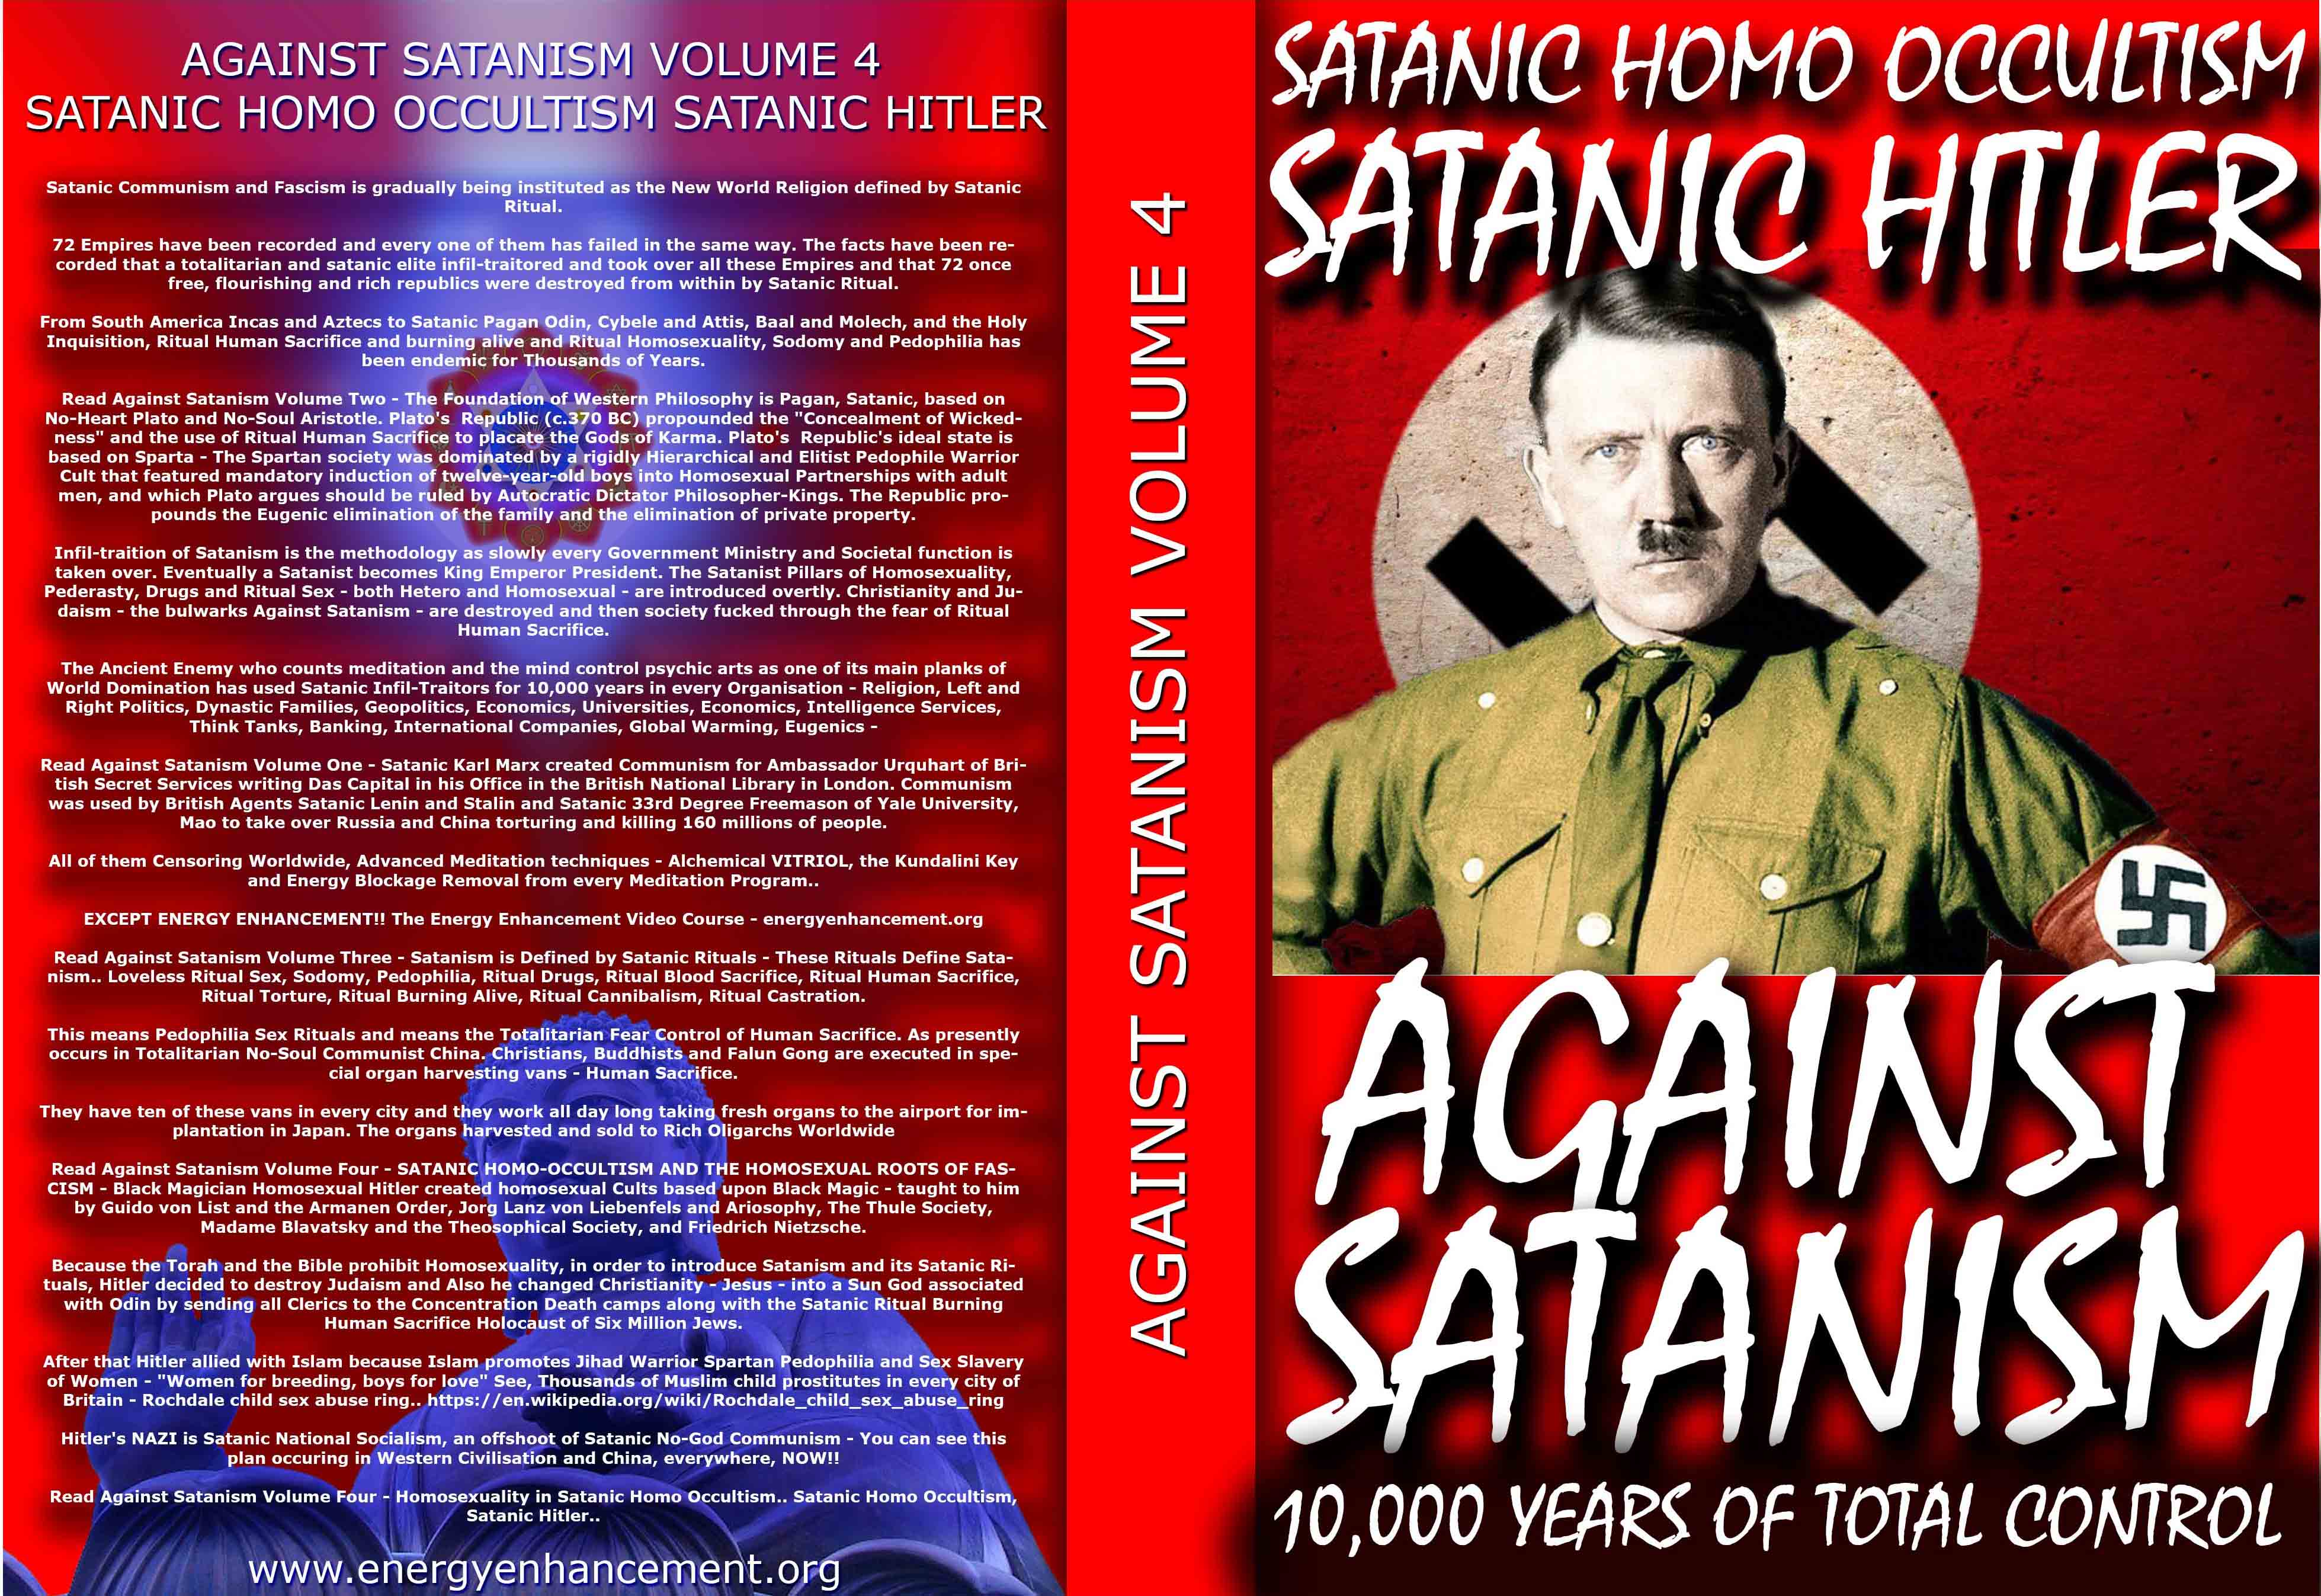 Description: Description: C:\wnew\Sacred-Energy\Against-Satanism-Volume-4\ANTI SATANIC 4 full coverr.jpg